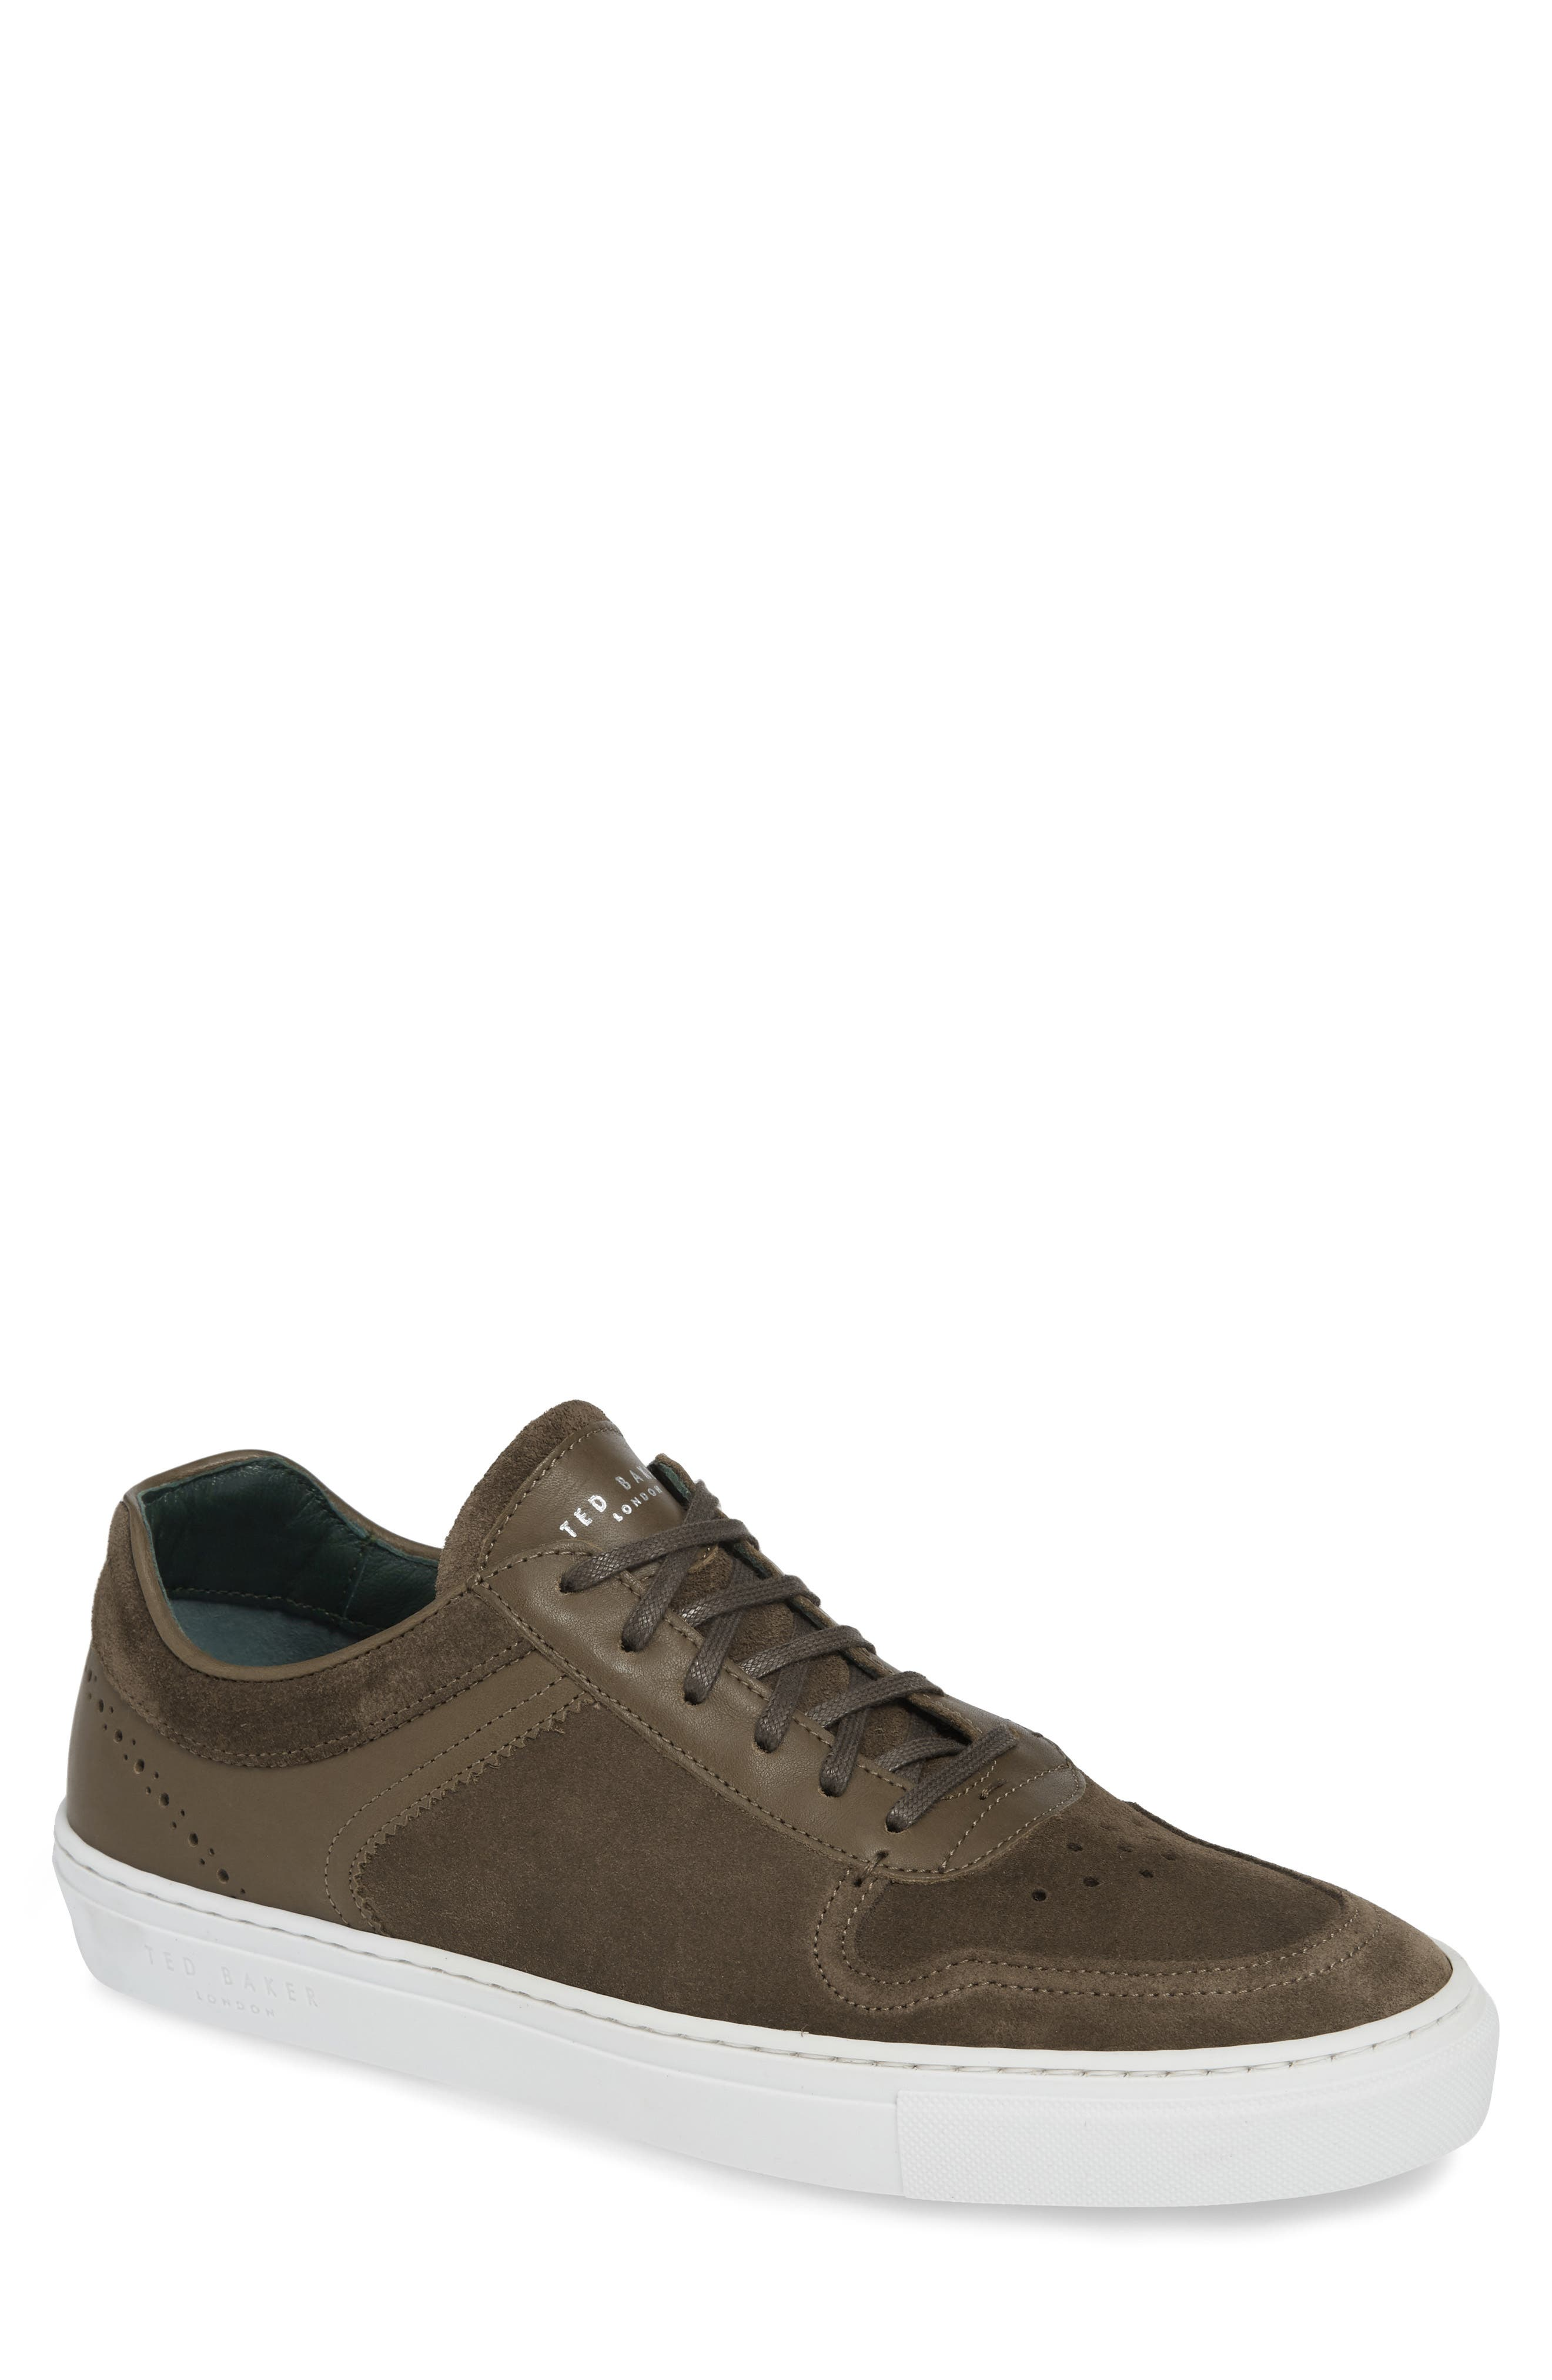 Burall Sneaker,                         Main,                         color, DARK GREEN SUEDE